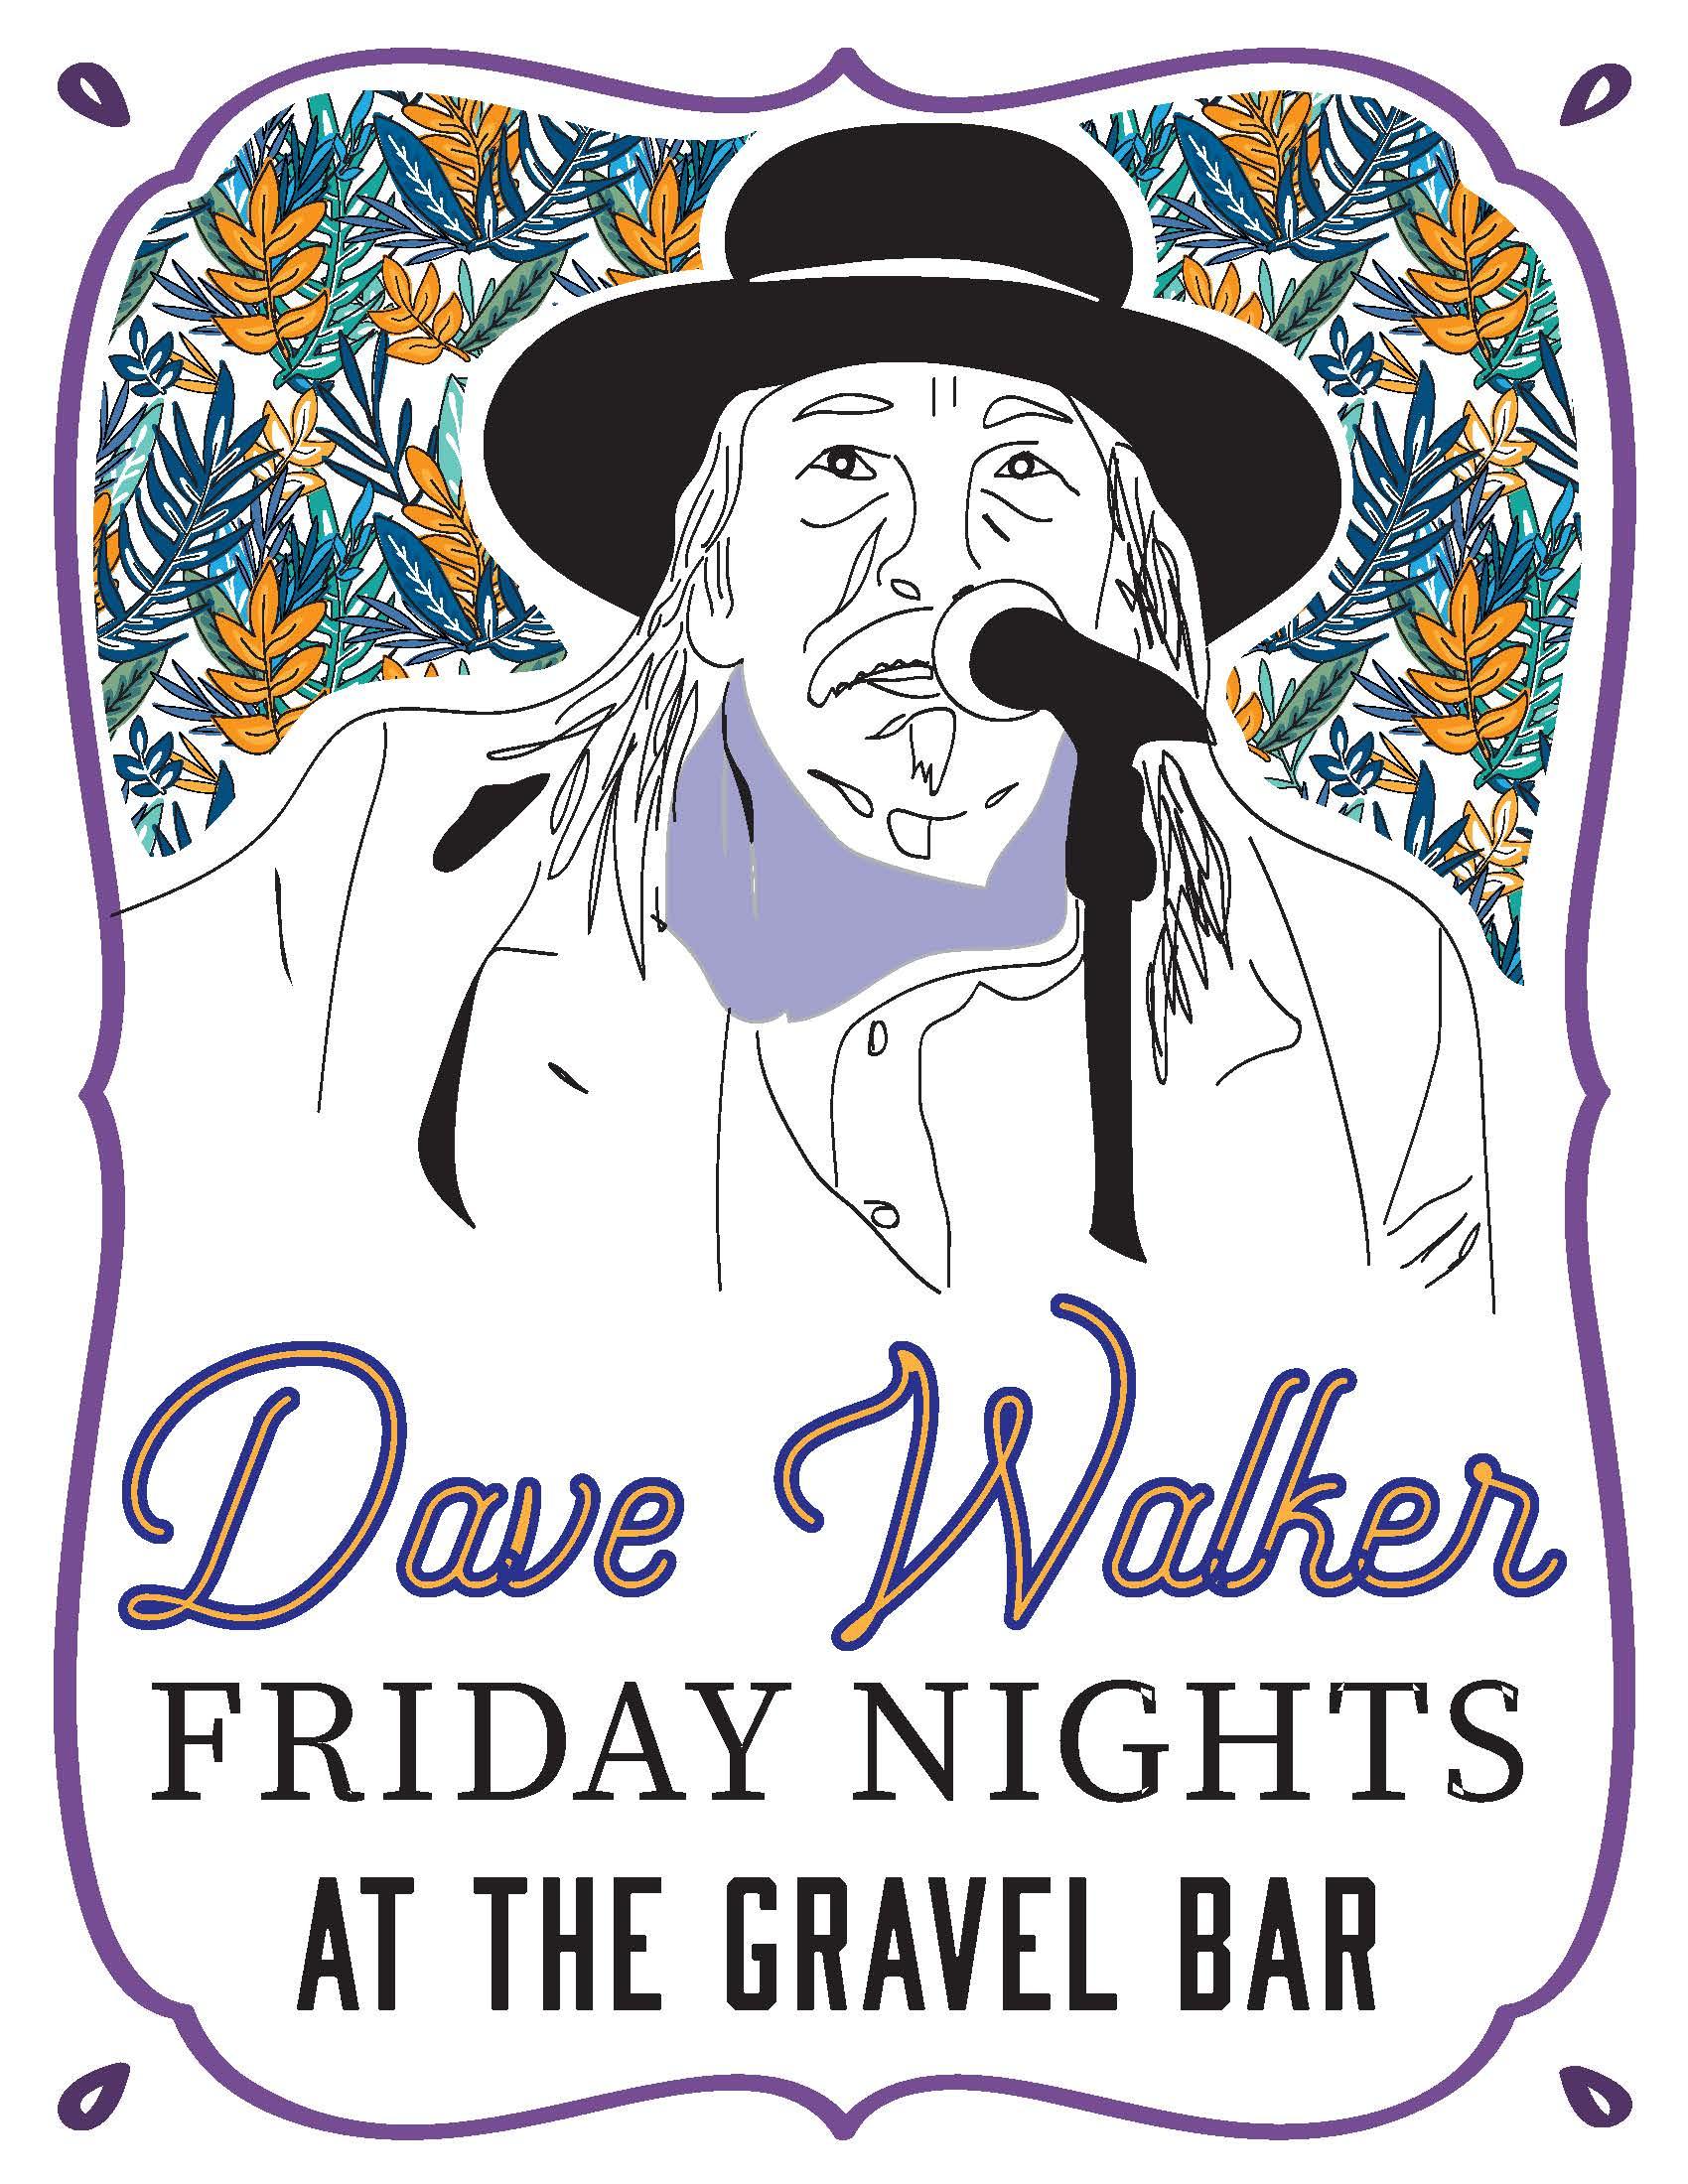 Dave Walker Winter Fridays Poster